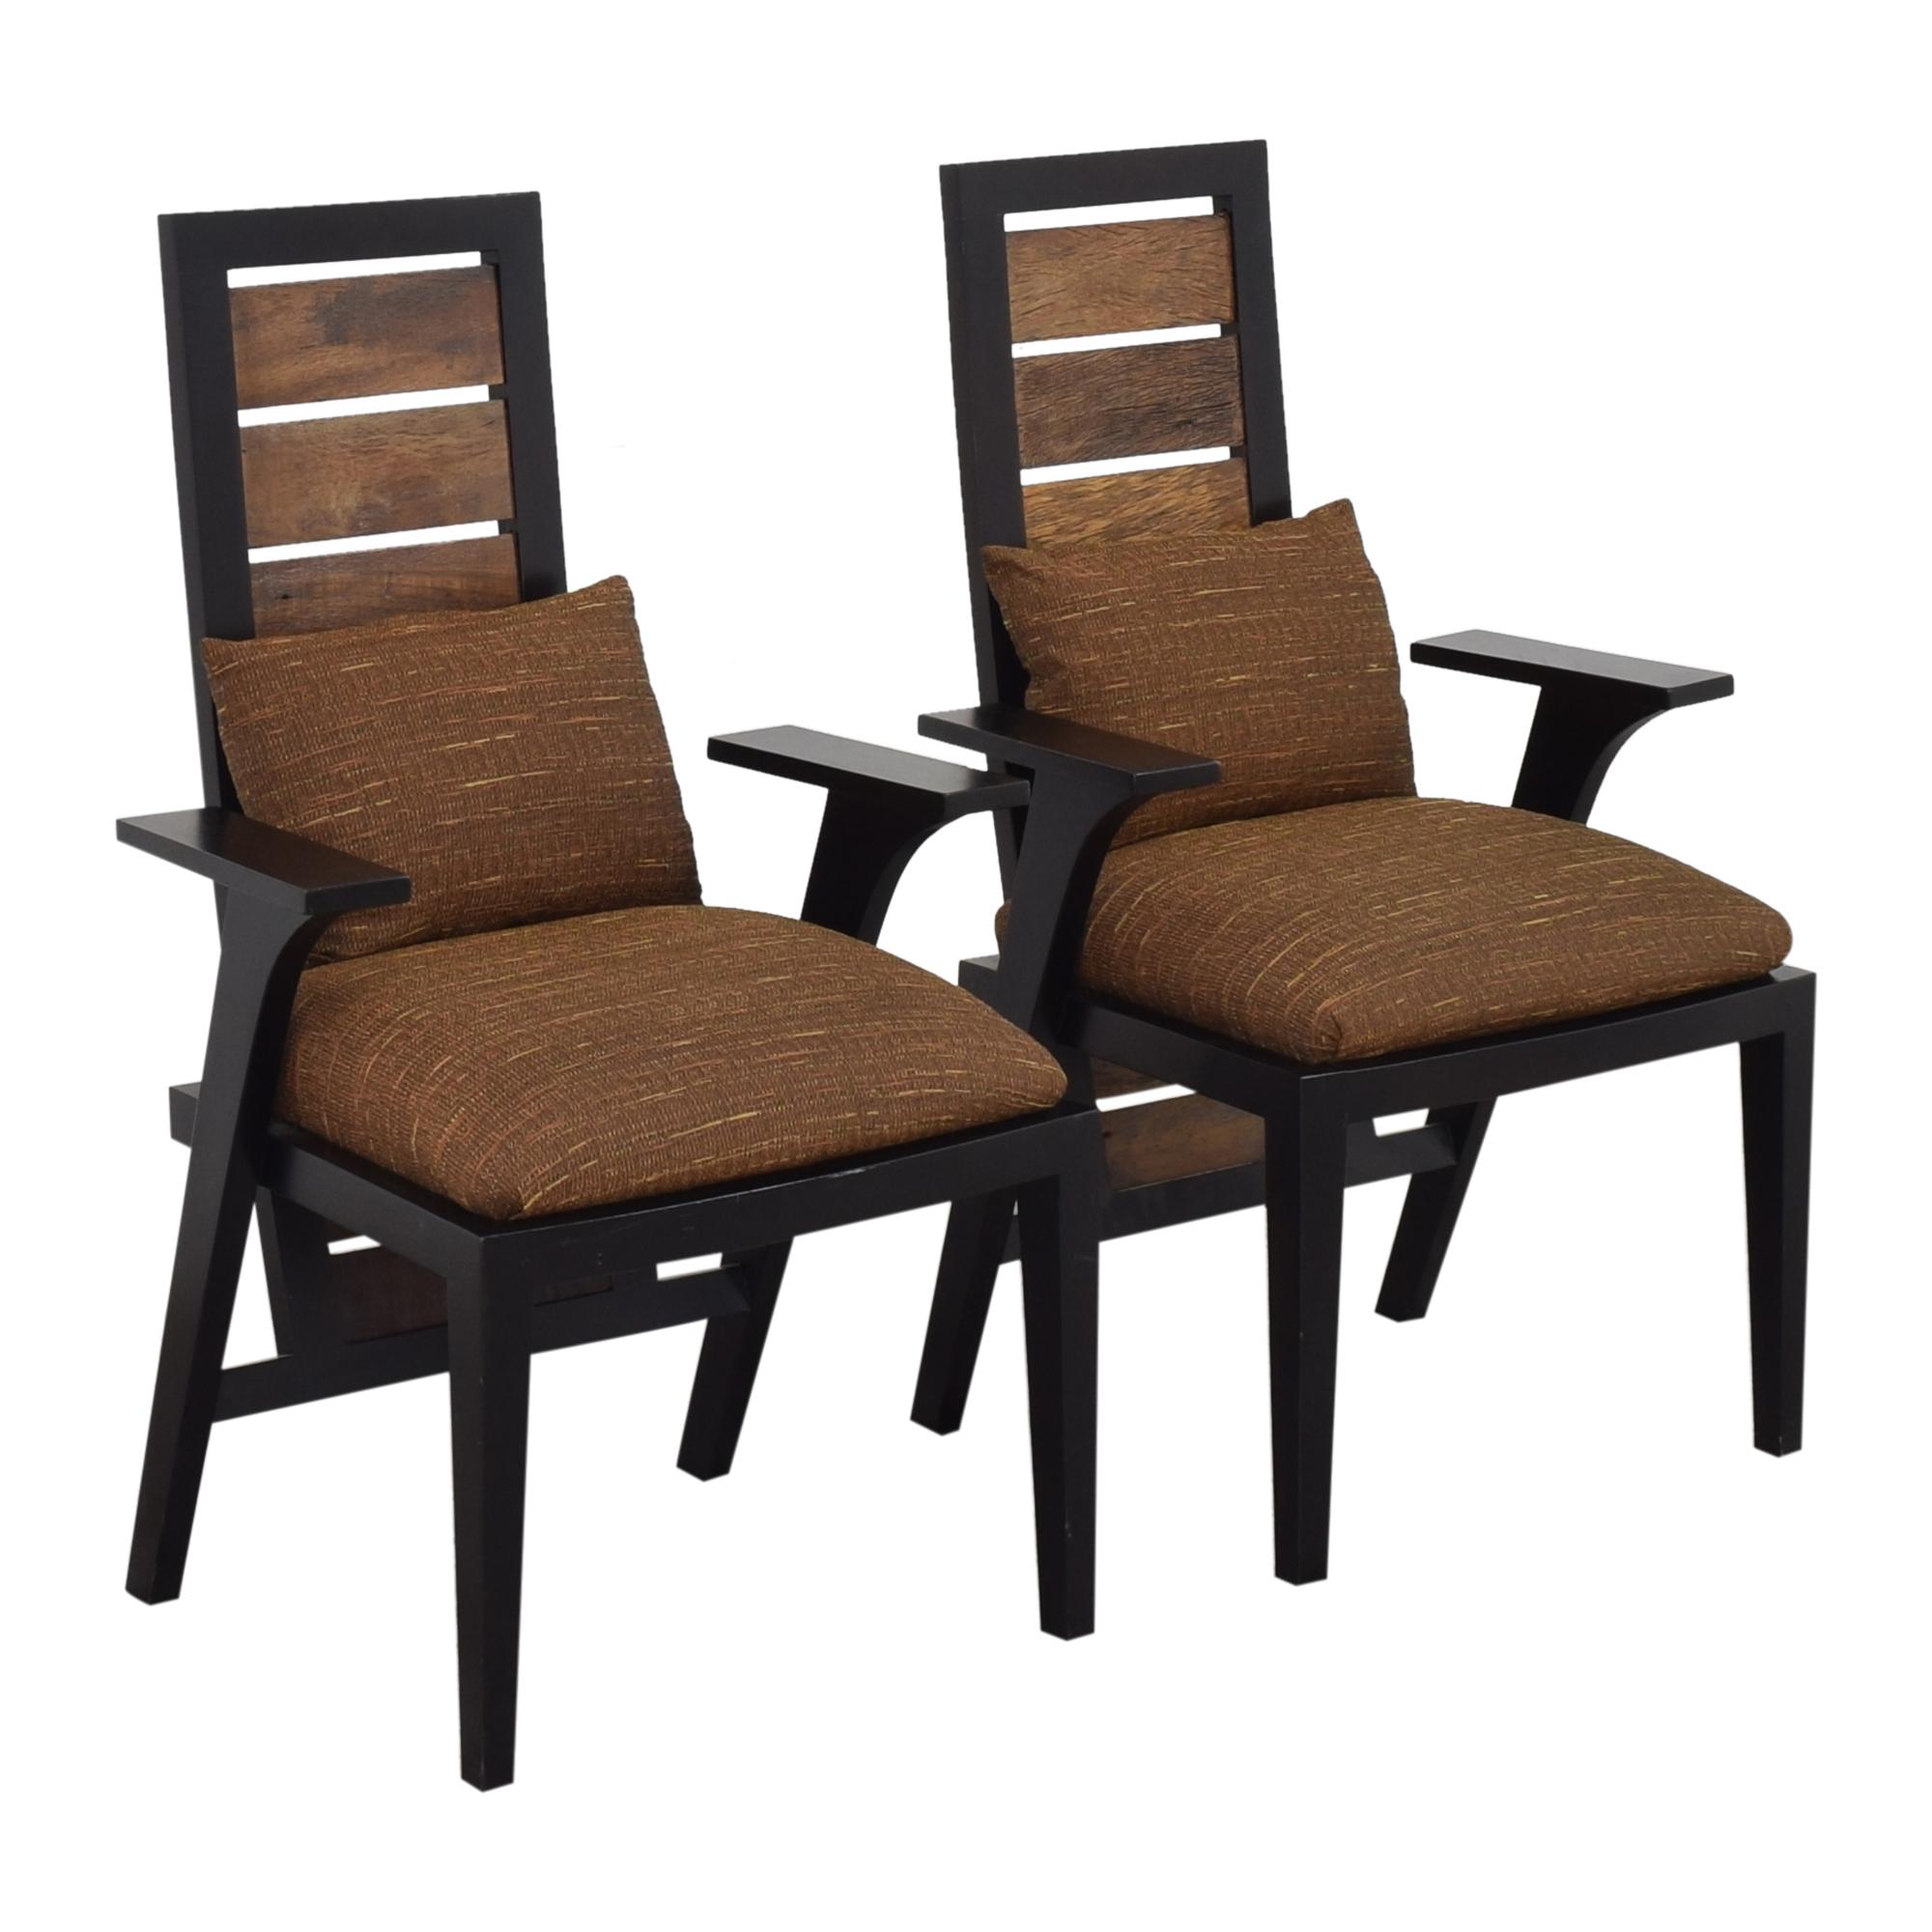 Environment Furniture Ipanema Chairs sale